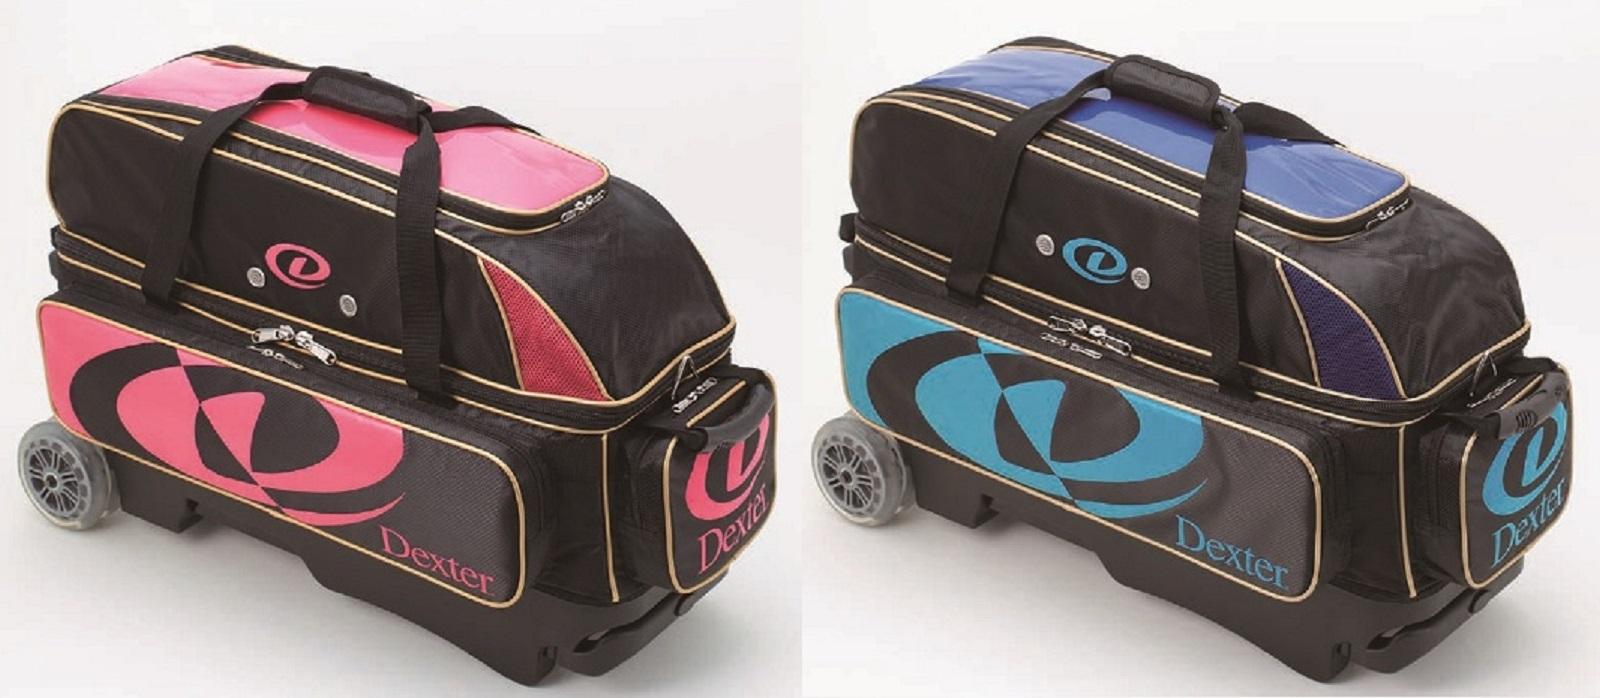 Dexter ボウリングバッグ トリプルローラーバッグ 全2色 【ボウリング用品】